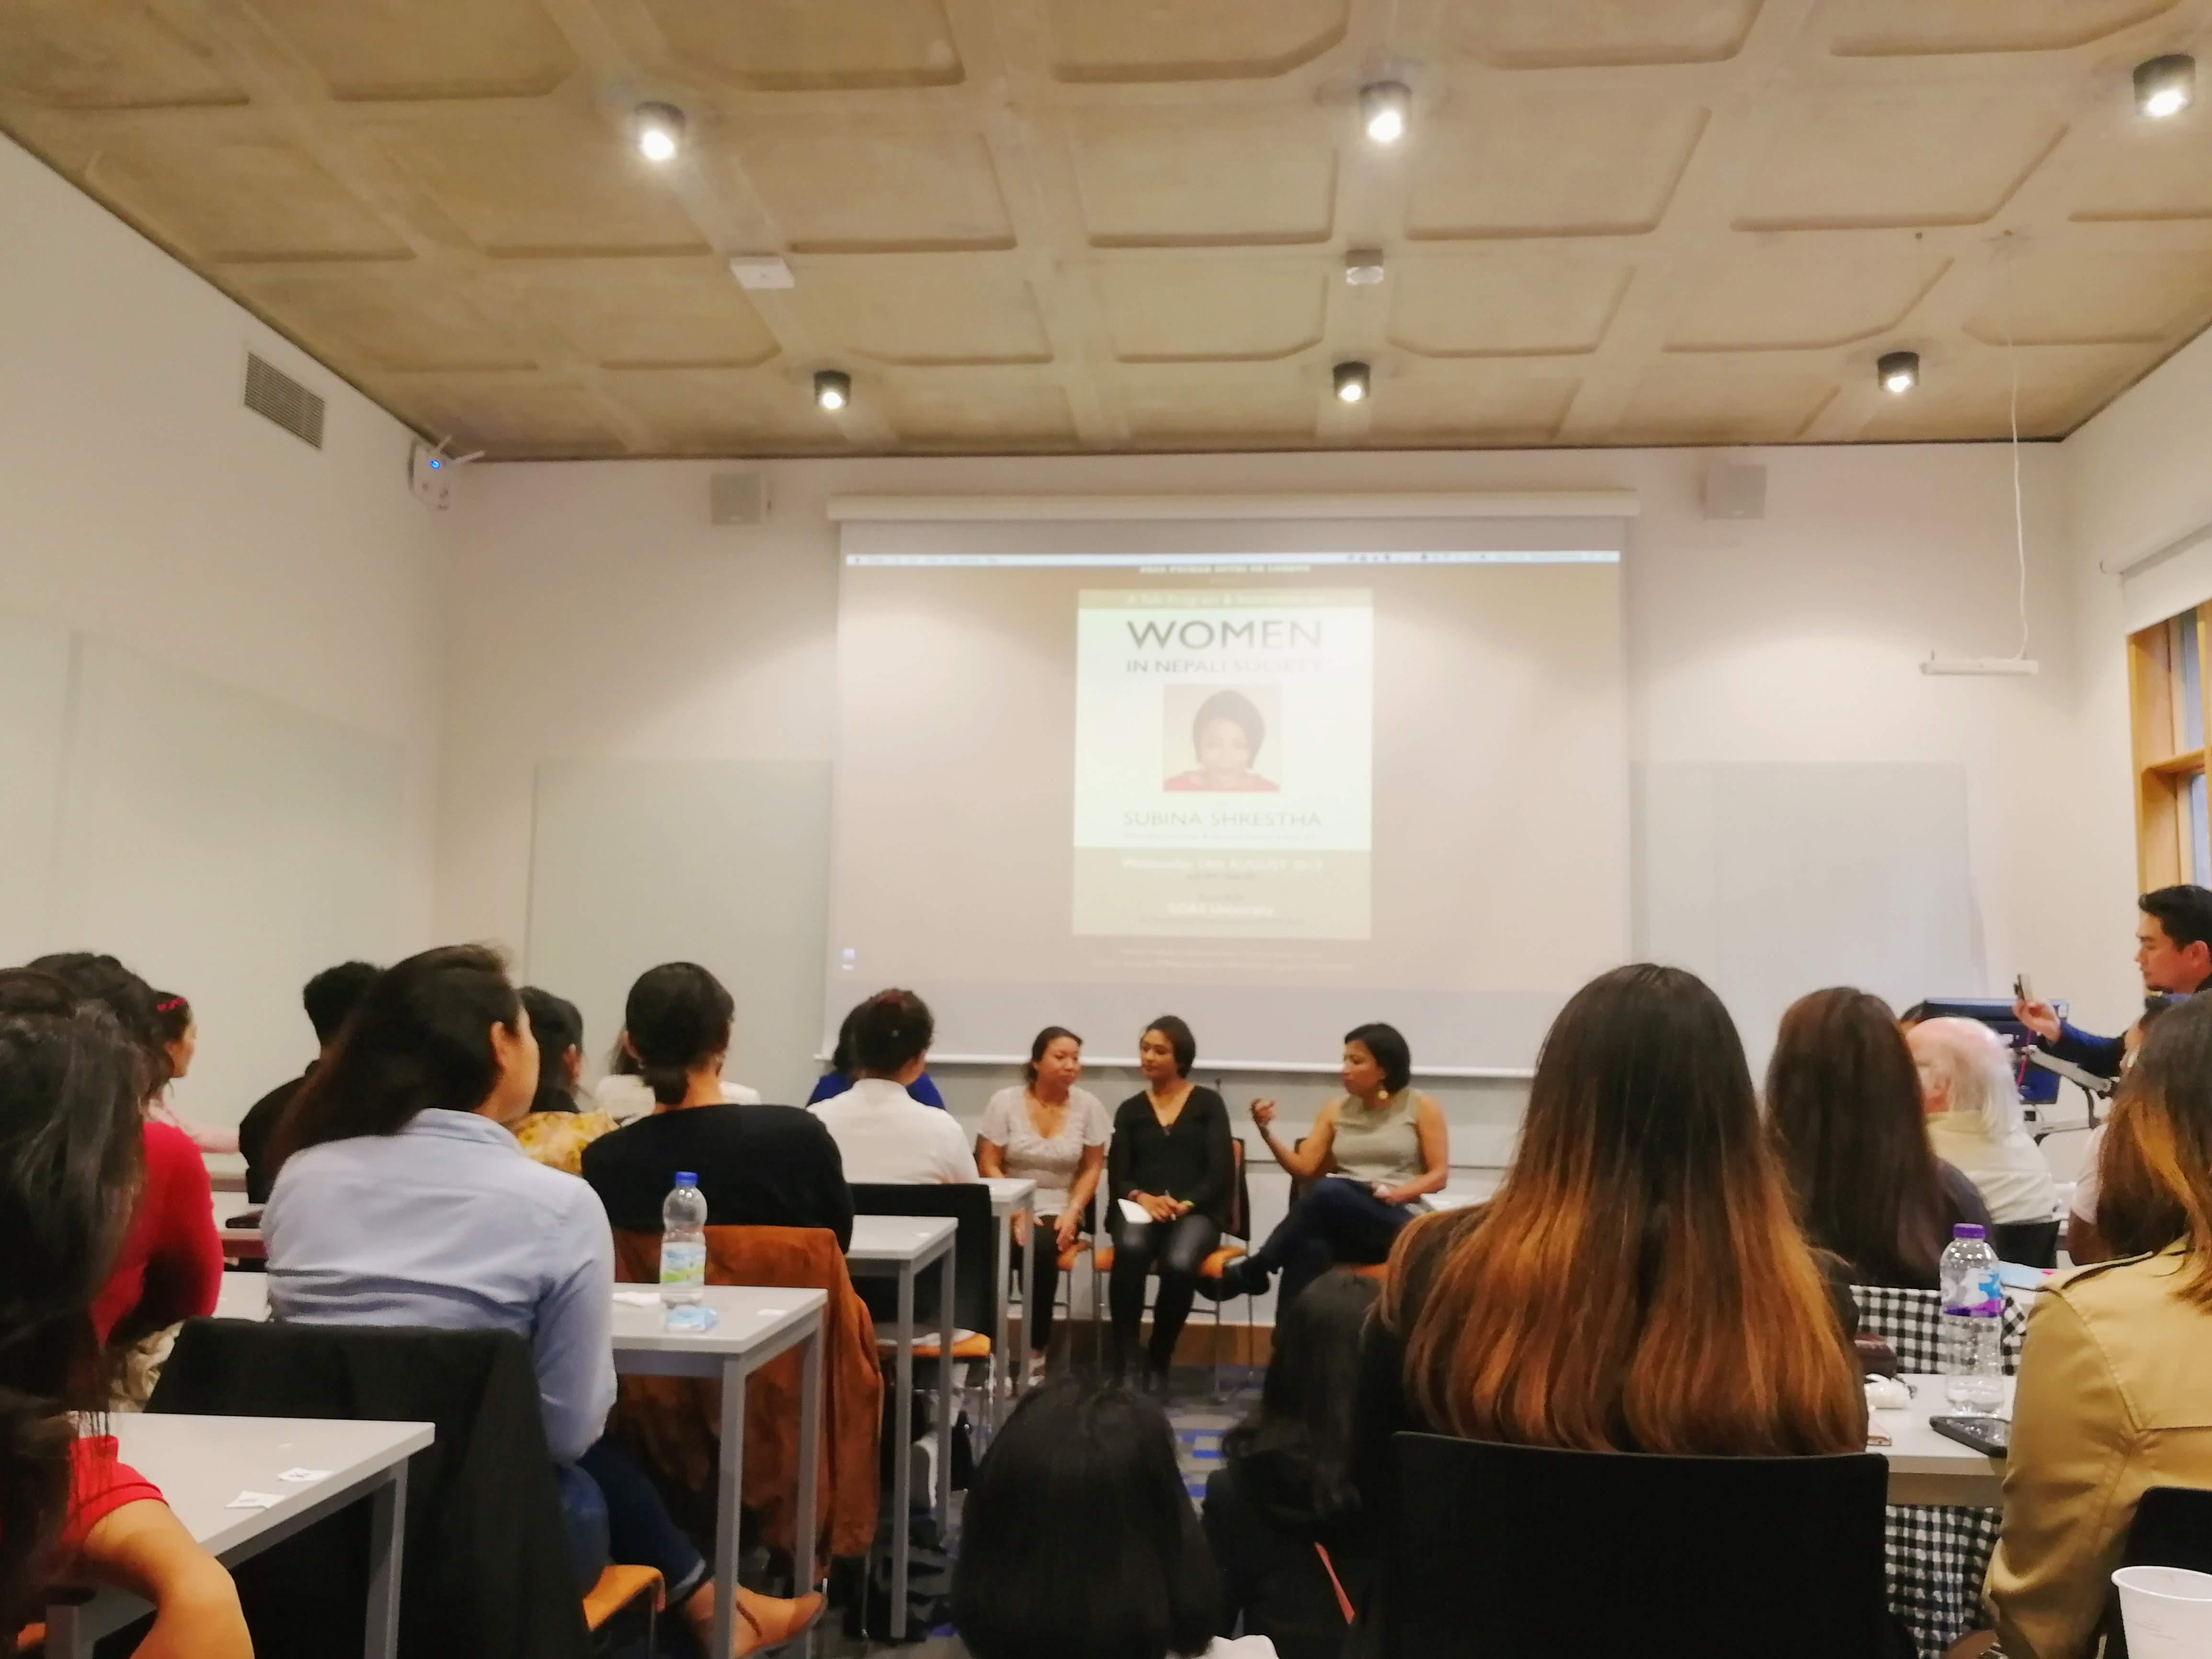 'Women in Nepali Society' with Subina Shrestha